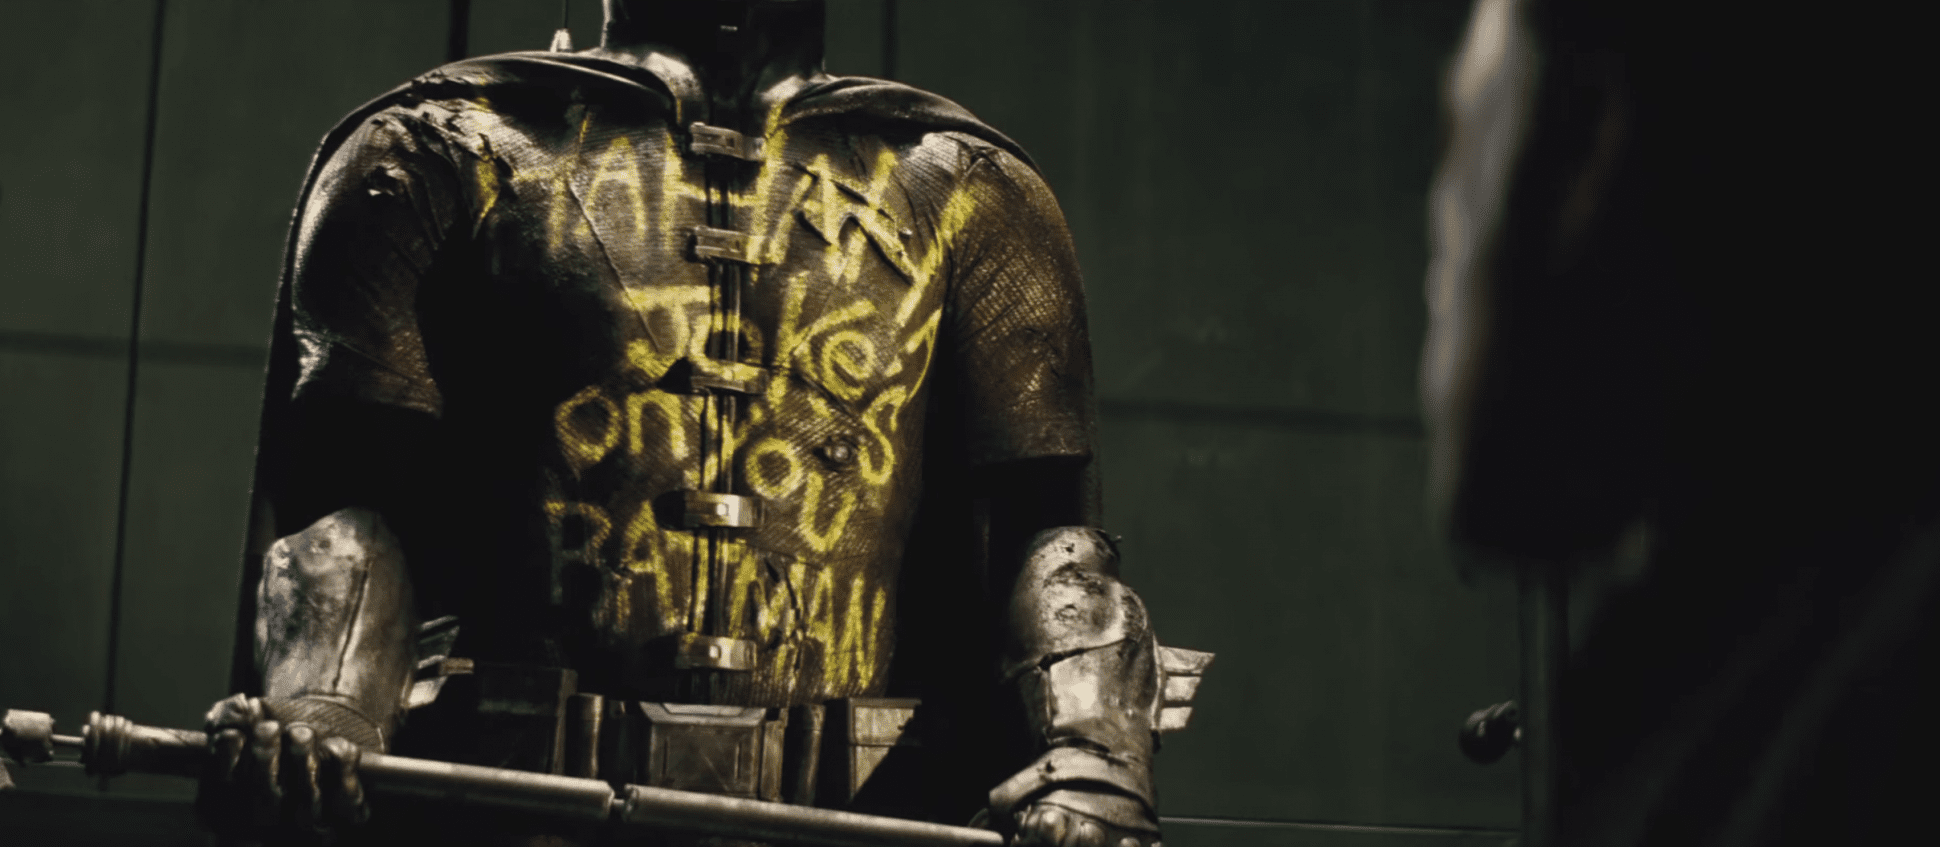 Batman-v-Superman-SDCC-trailer-1-1940x847